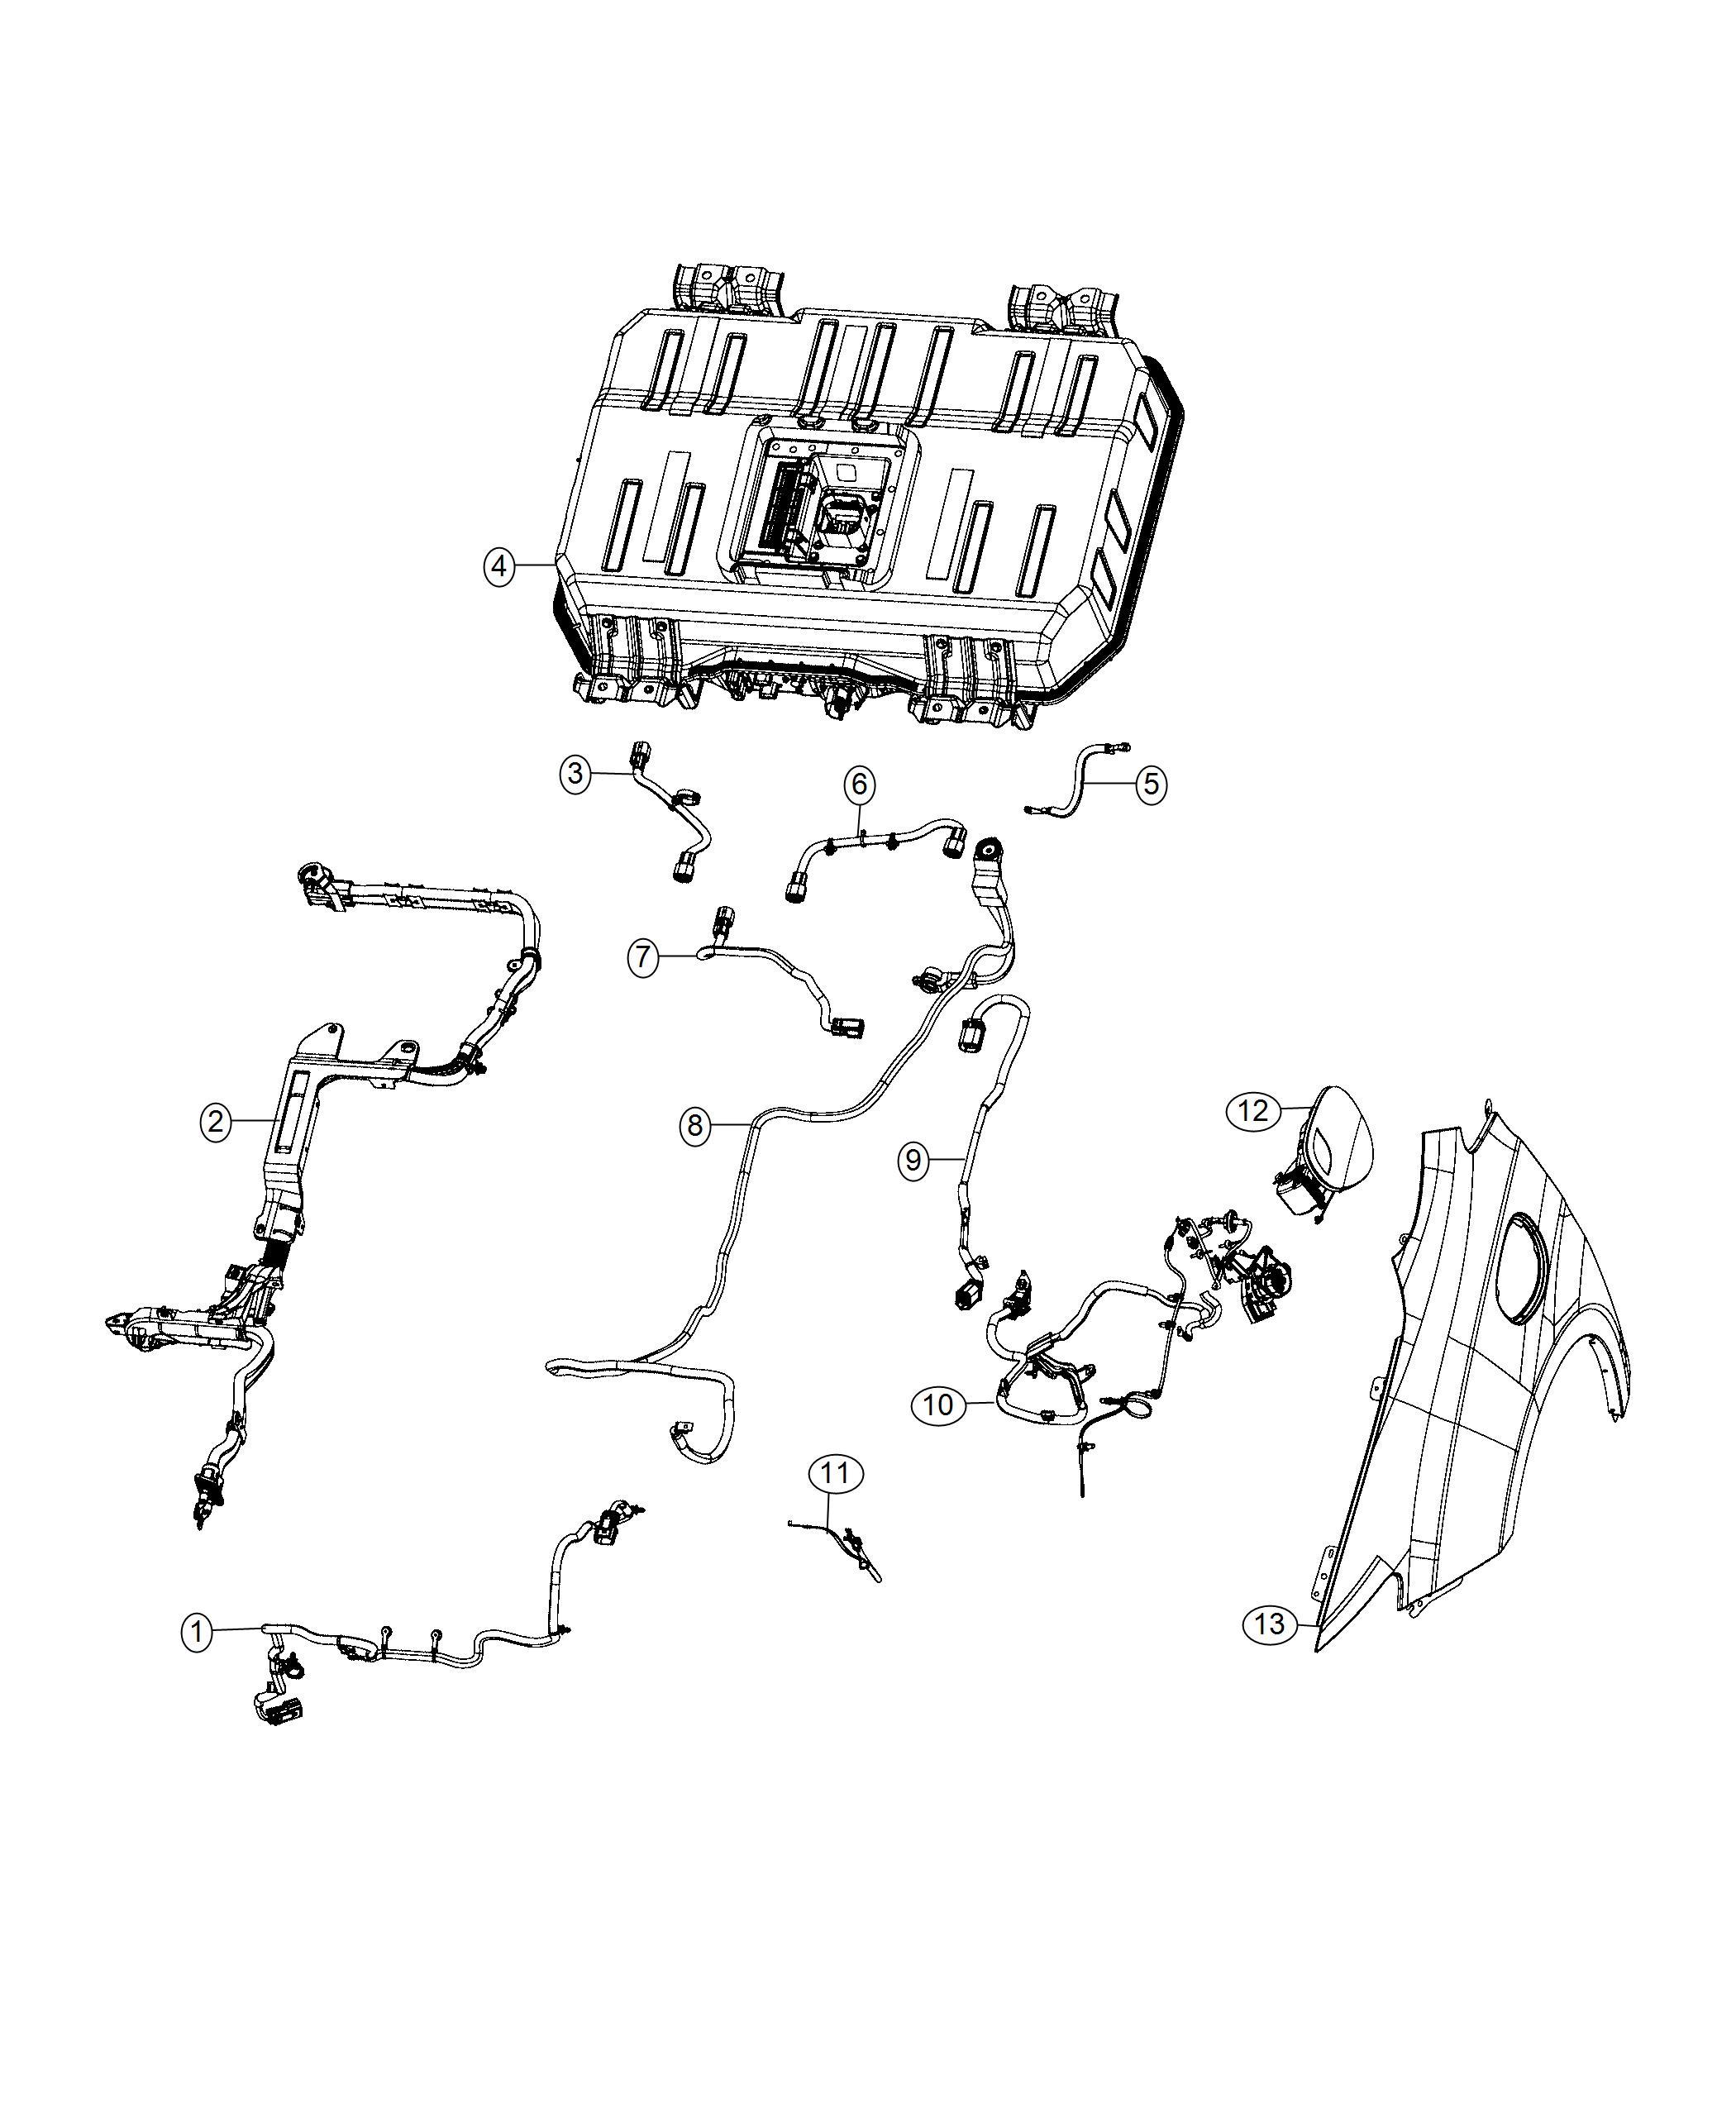 Chrysler PACIFICA L HYBRID Wiring. [phev adaptation